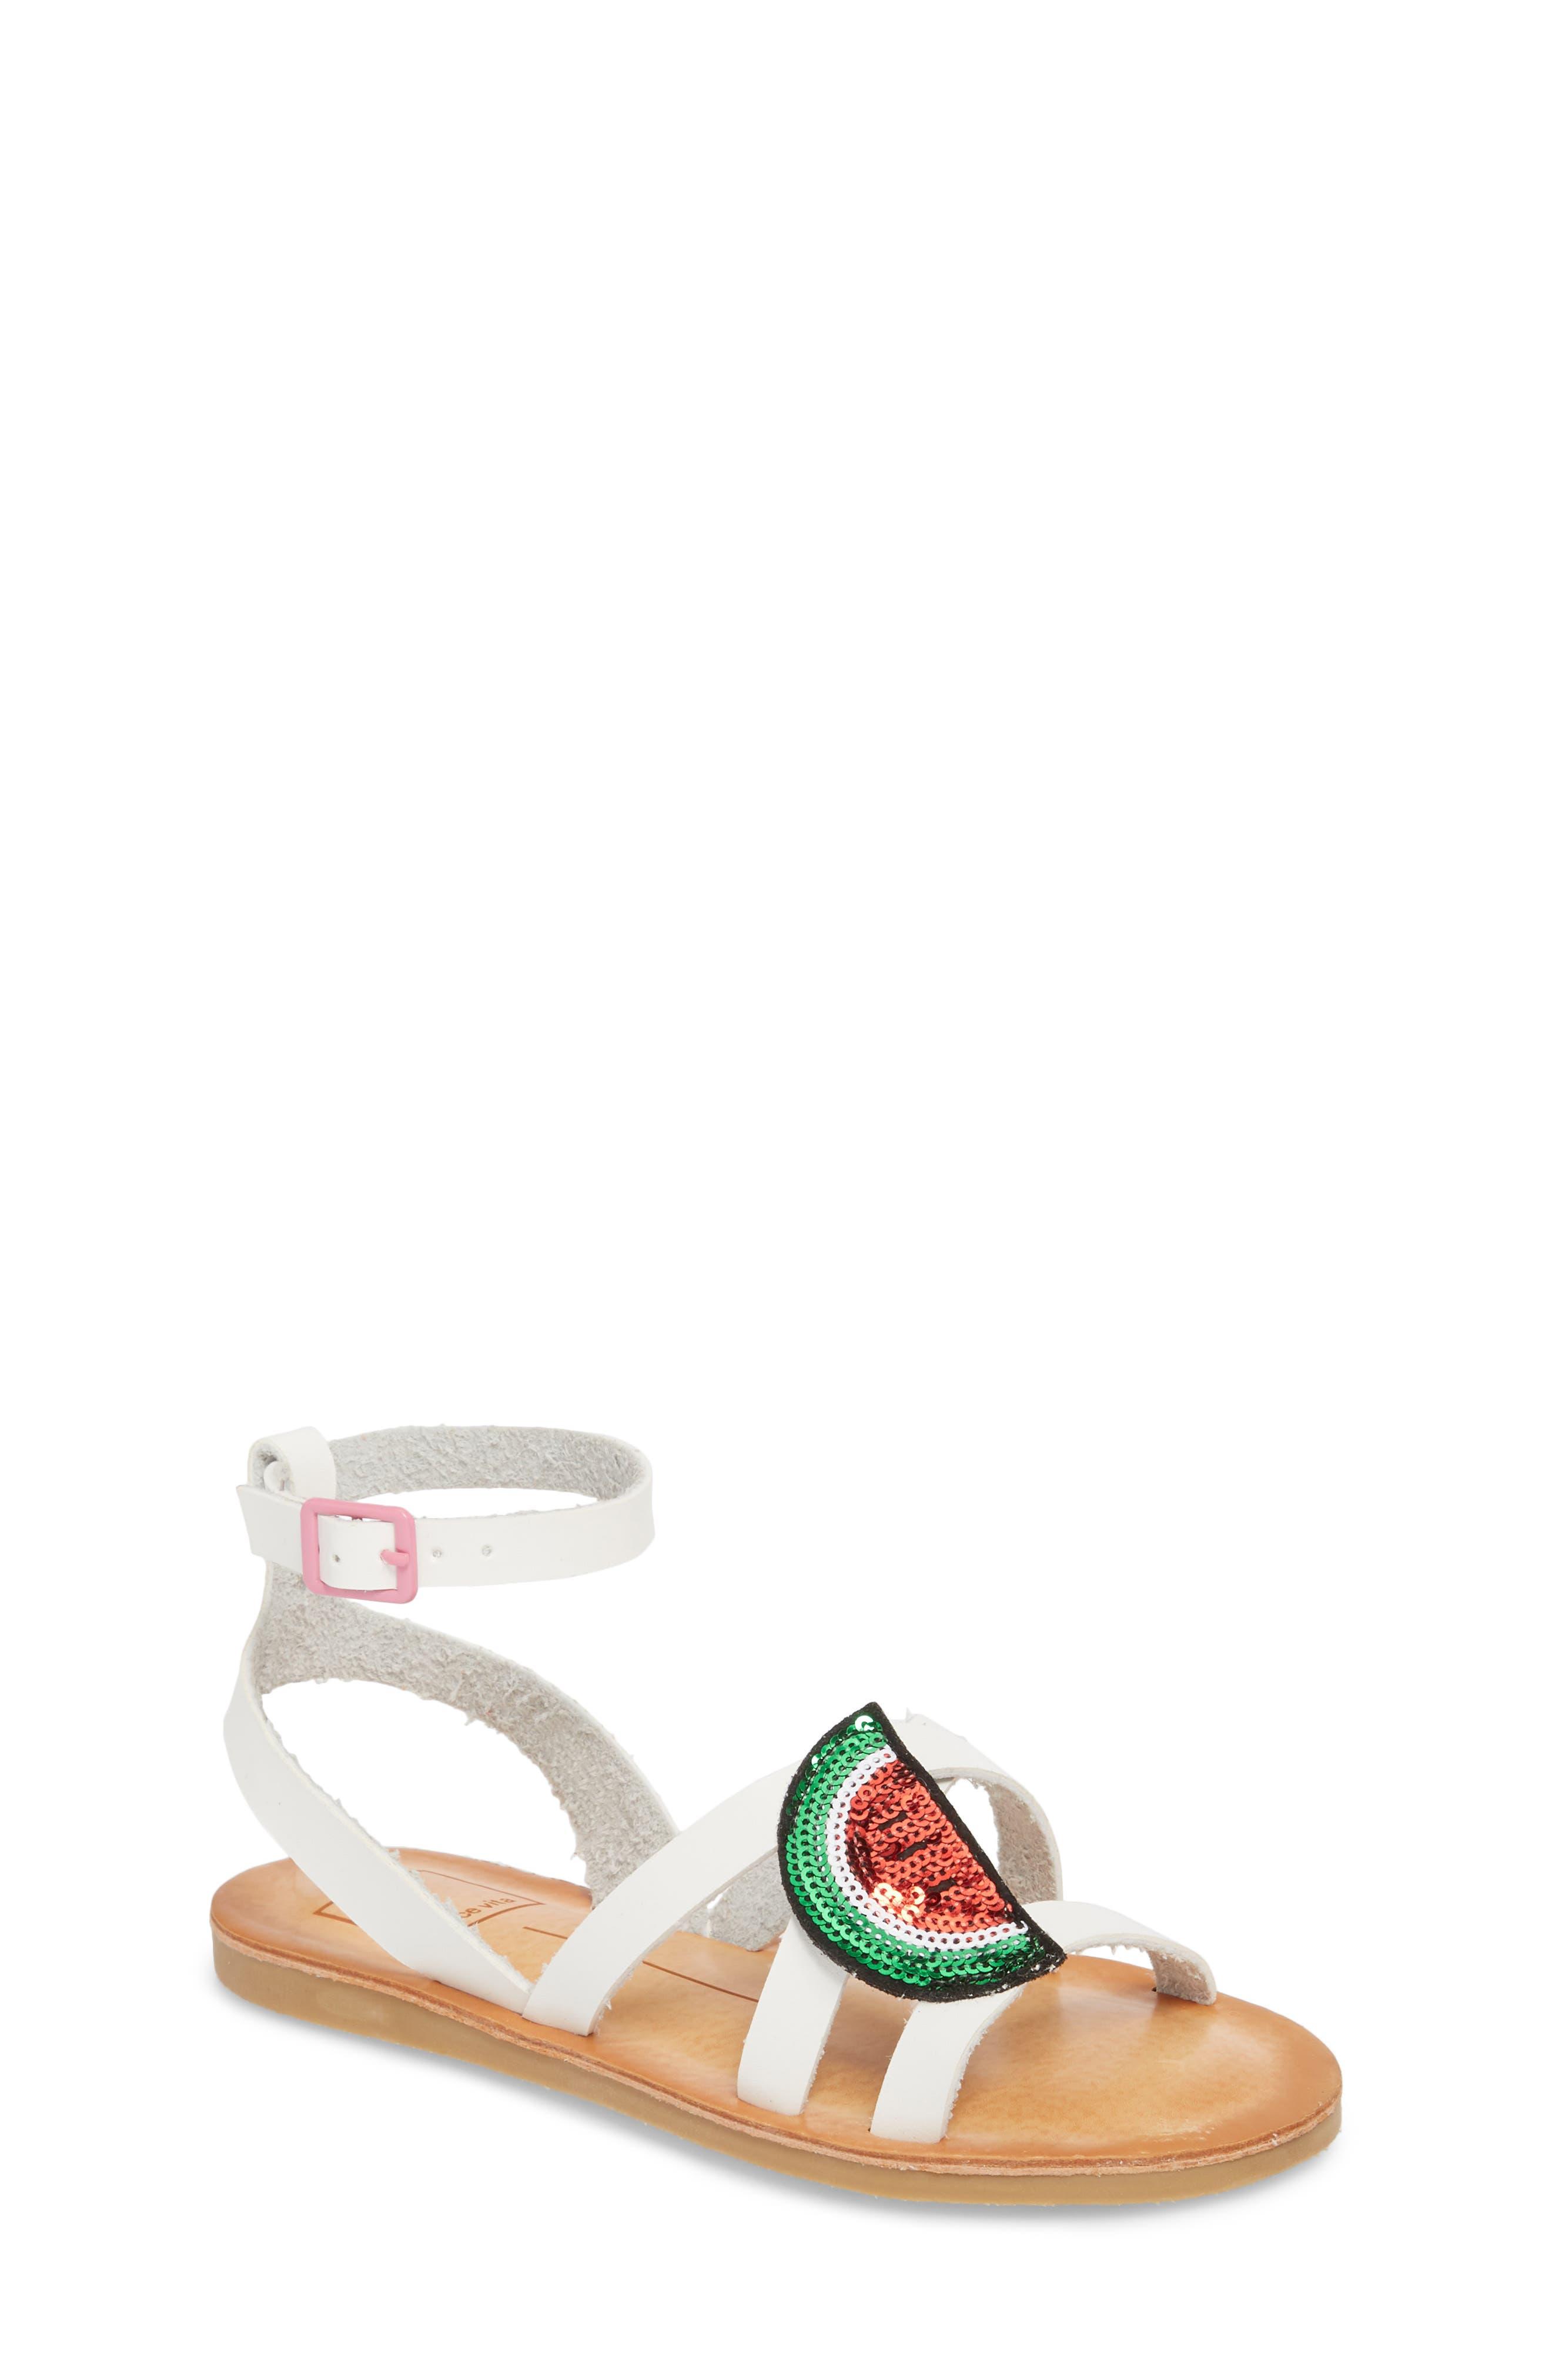 Jaclin Fruit Sequined Sandal,                         Main,                         color, White